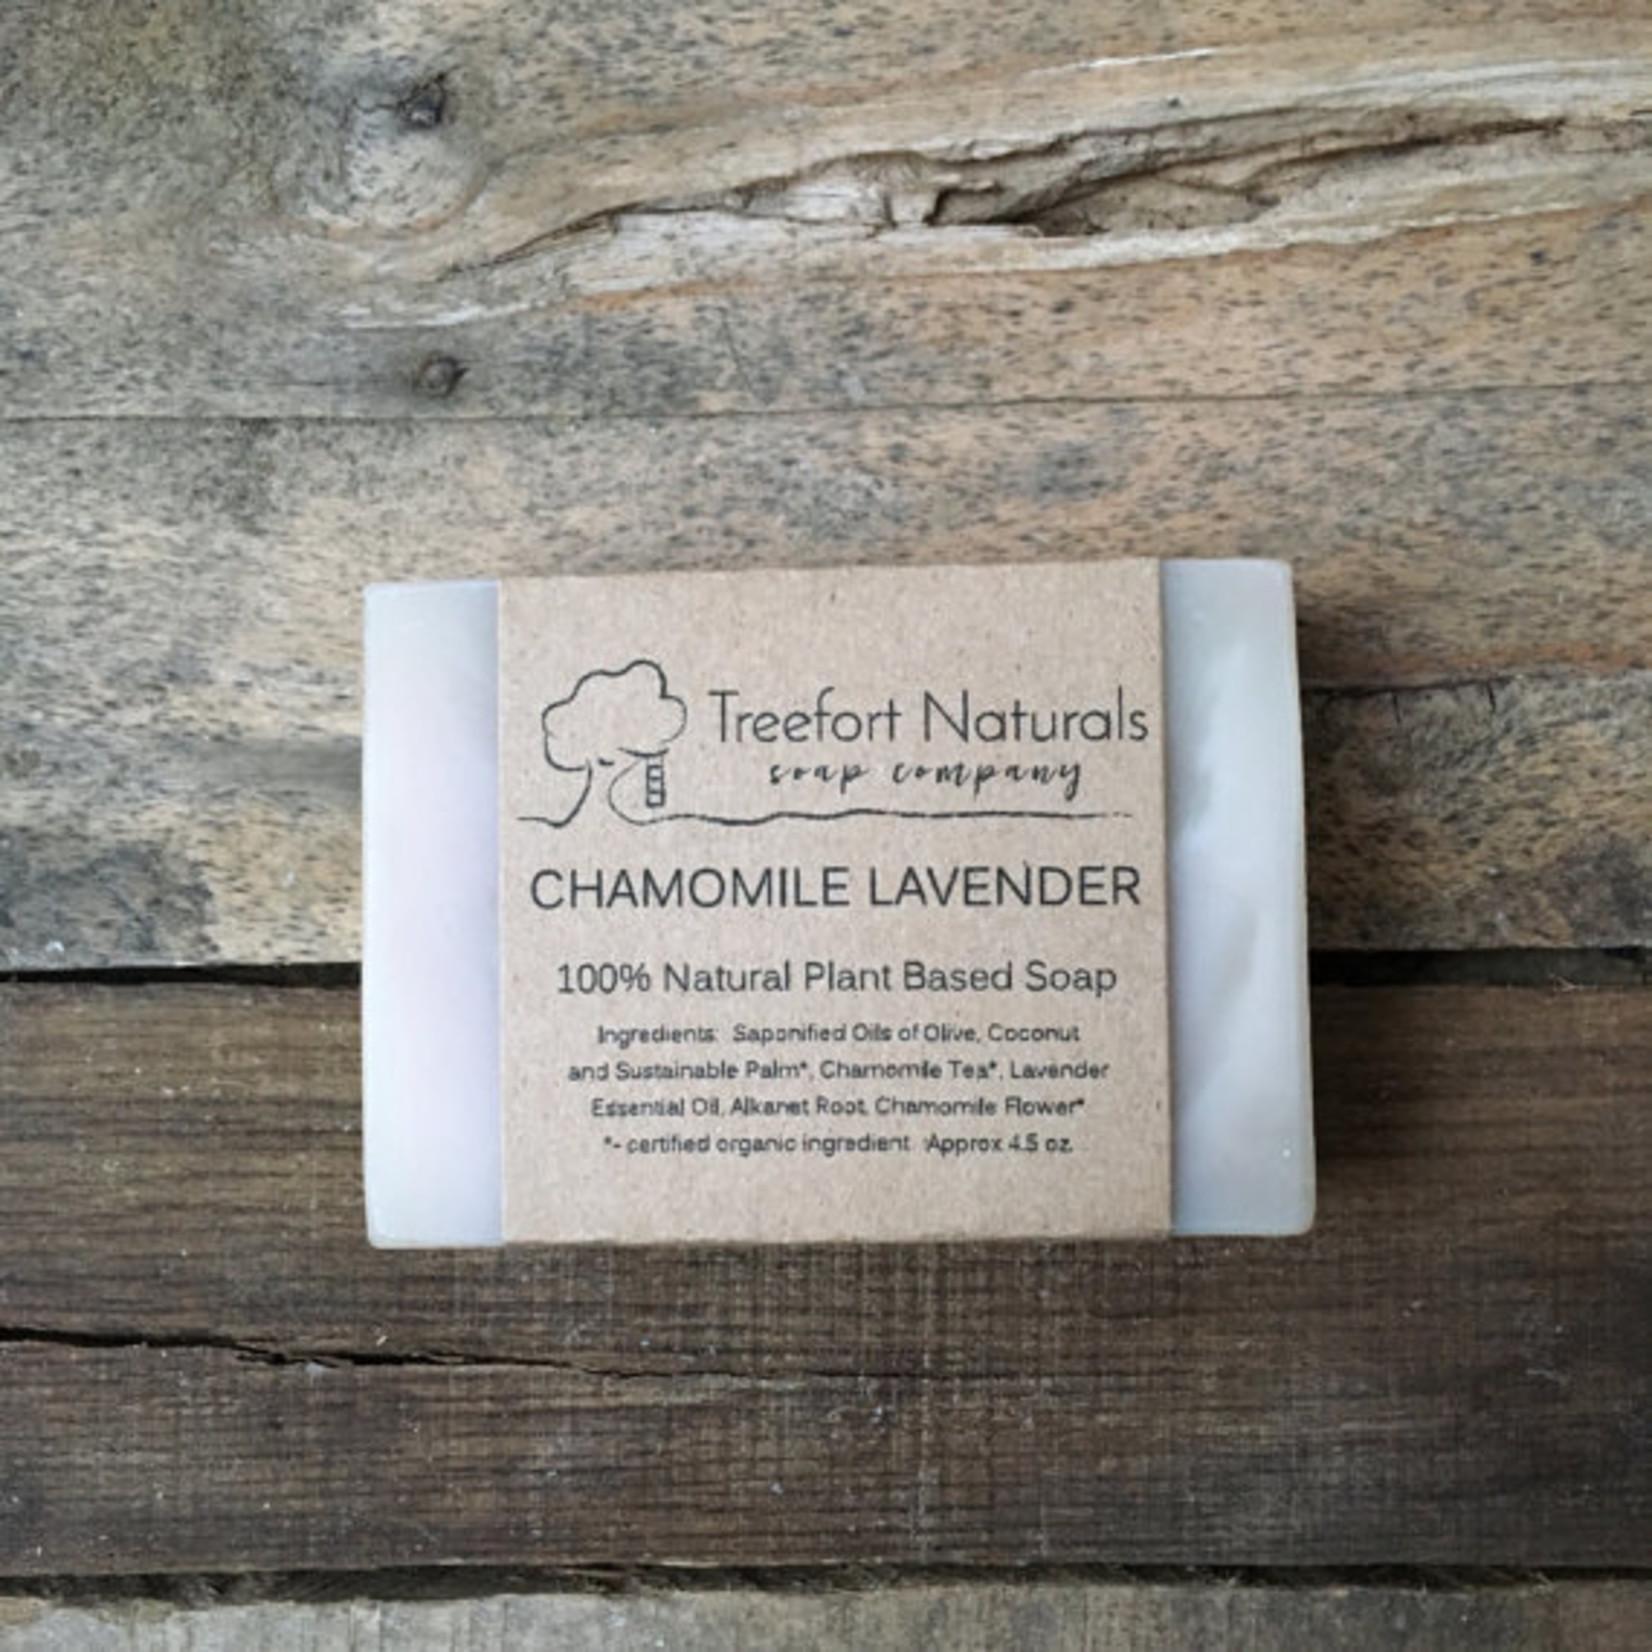 Treefort Naturals Treefort Naturals Chamomile Lavender Soap